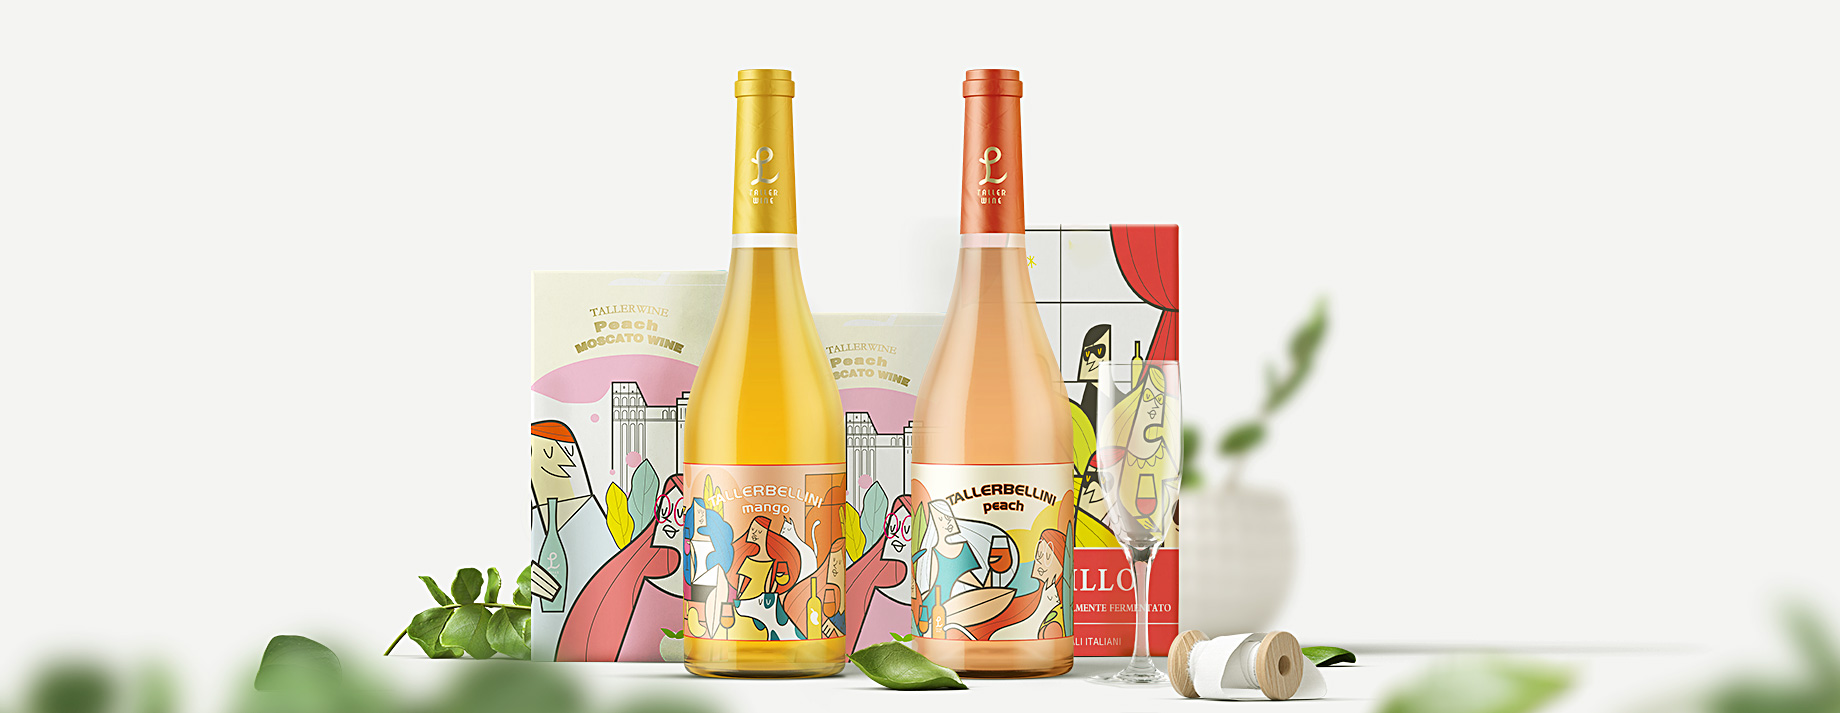 《taller wine》果酒系列产品包装插画设计